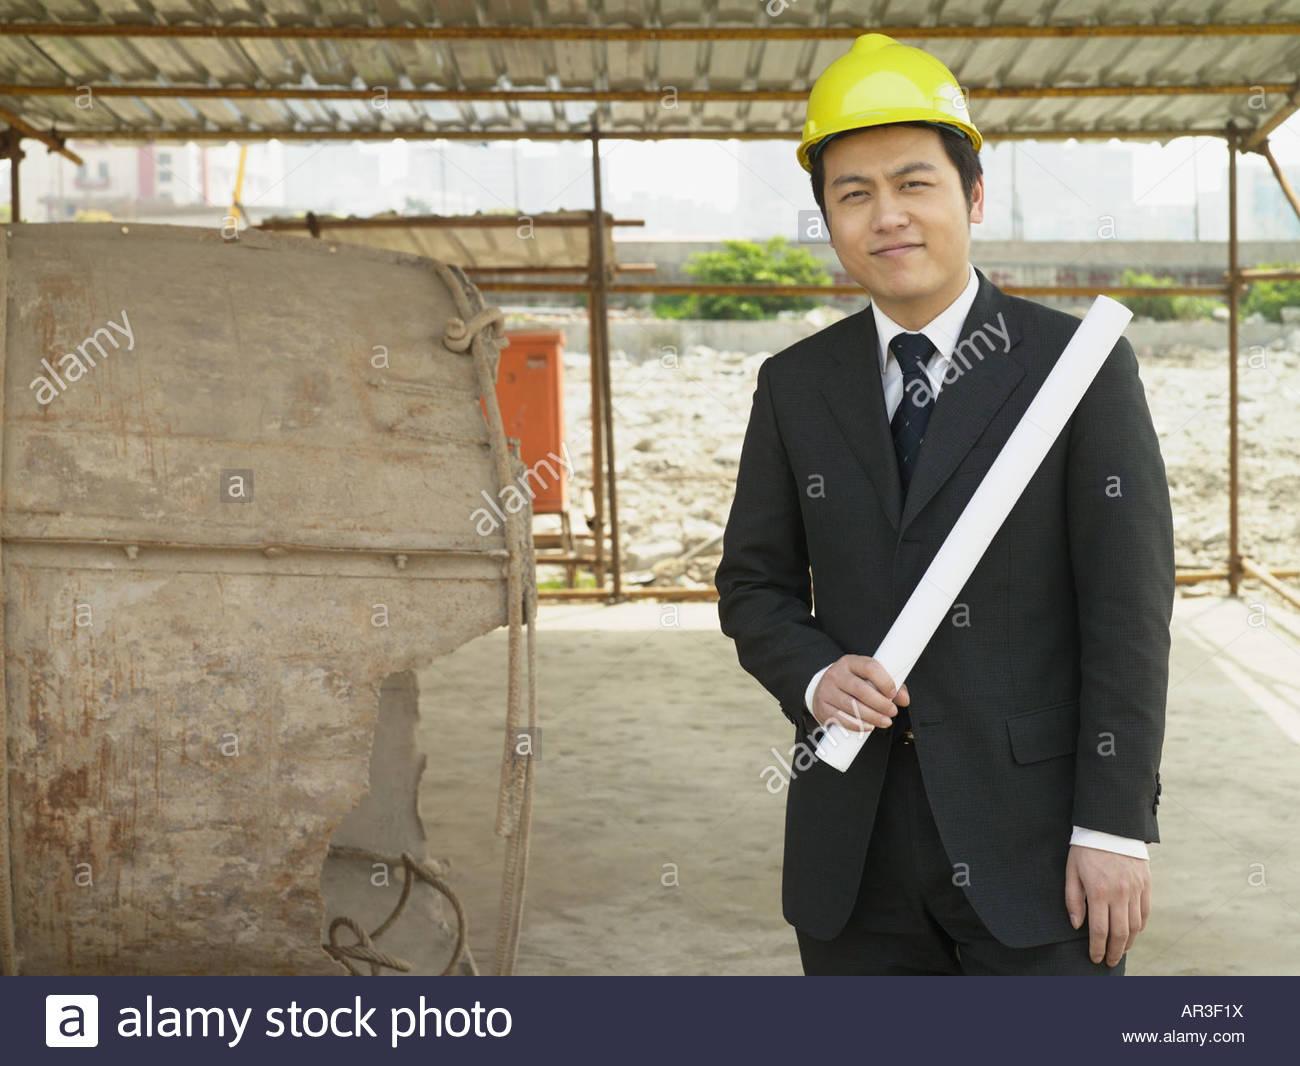 Architect on site - Stock Image